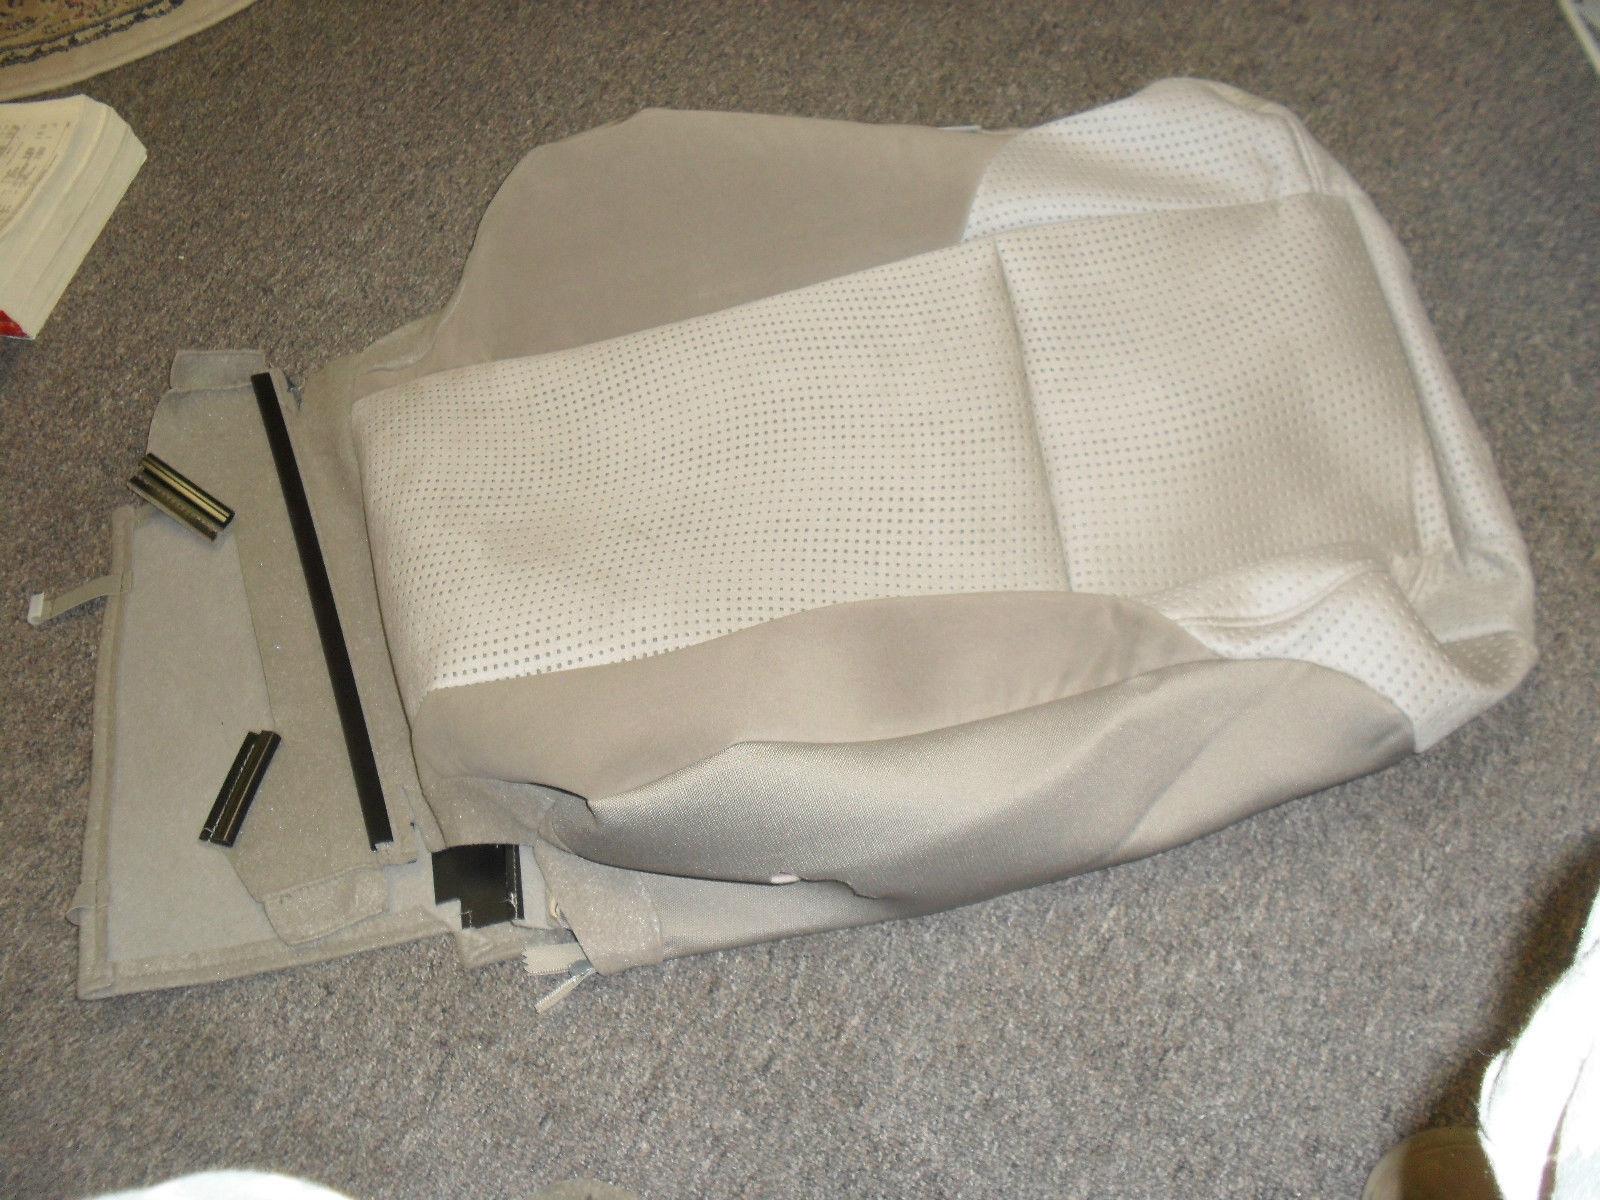 New Honda Crv Cr V Cr V Seat Cover Replacement 12 13 2012